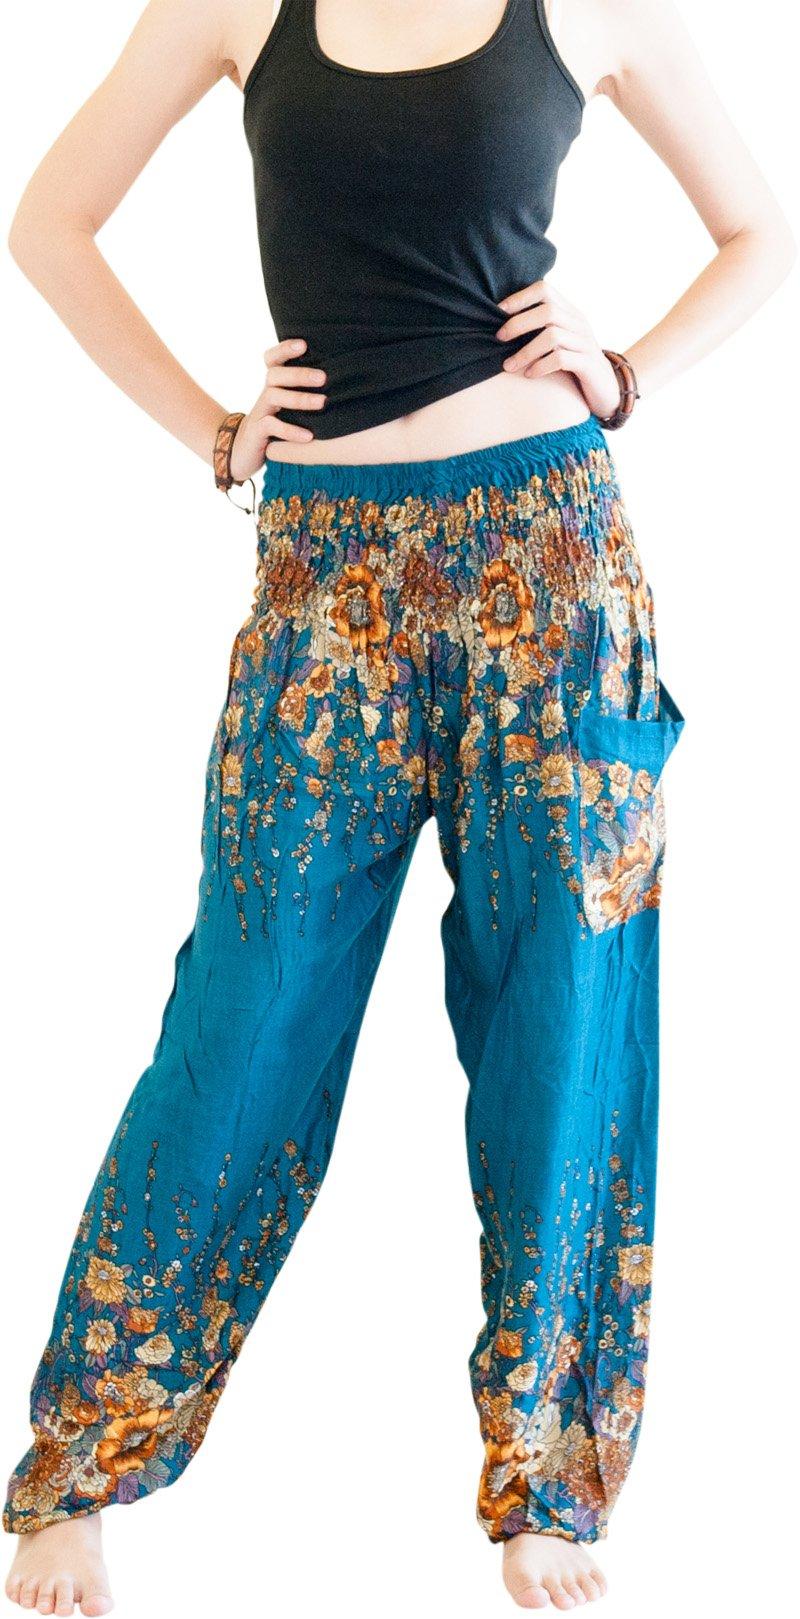 Flora Roses Harem Pants Women's Bohemian Pants (Free Size US: 0-14, Teal)